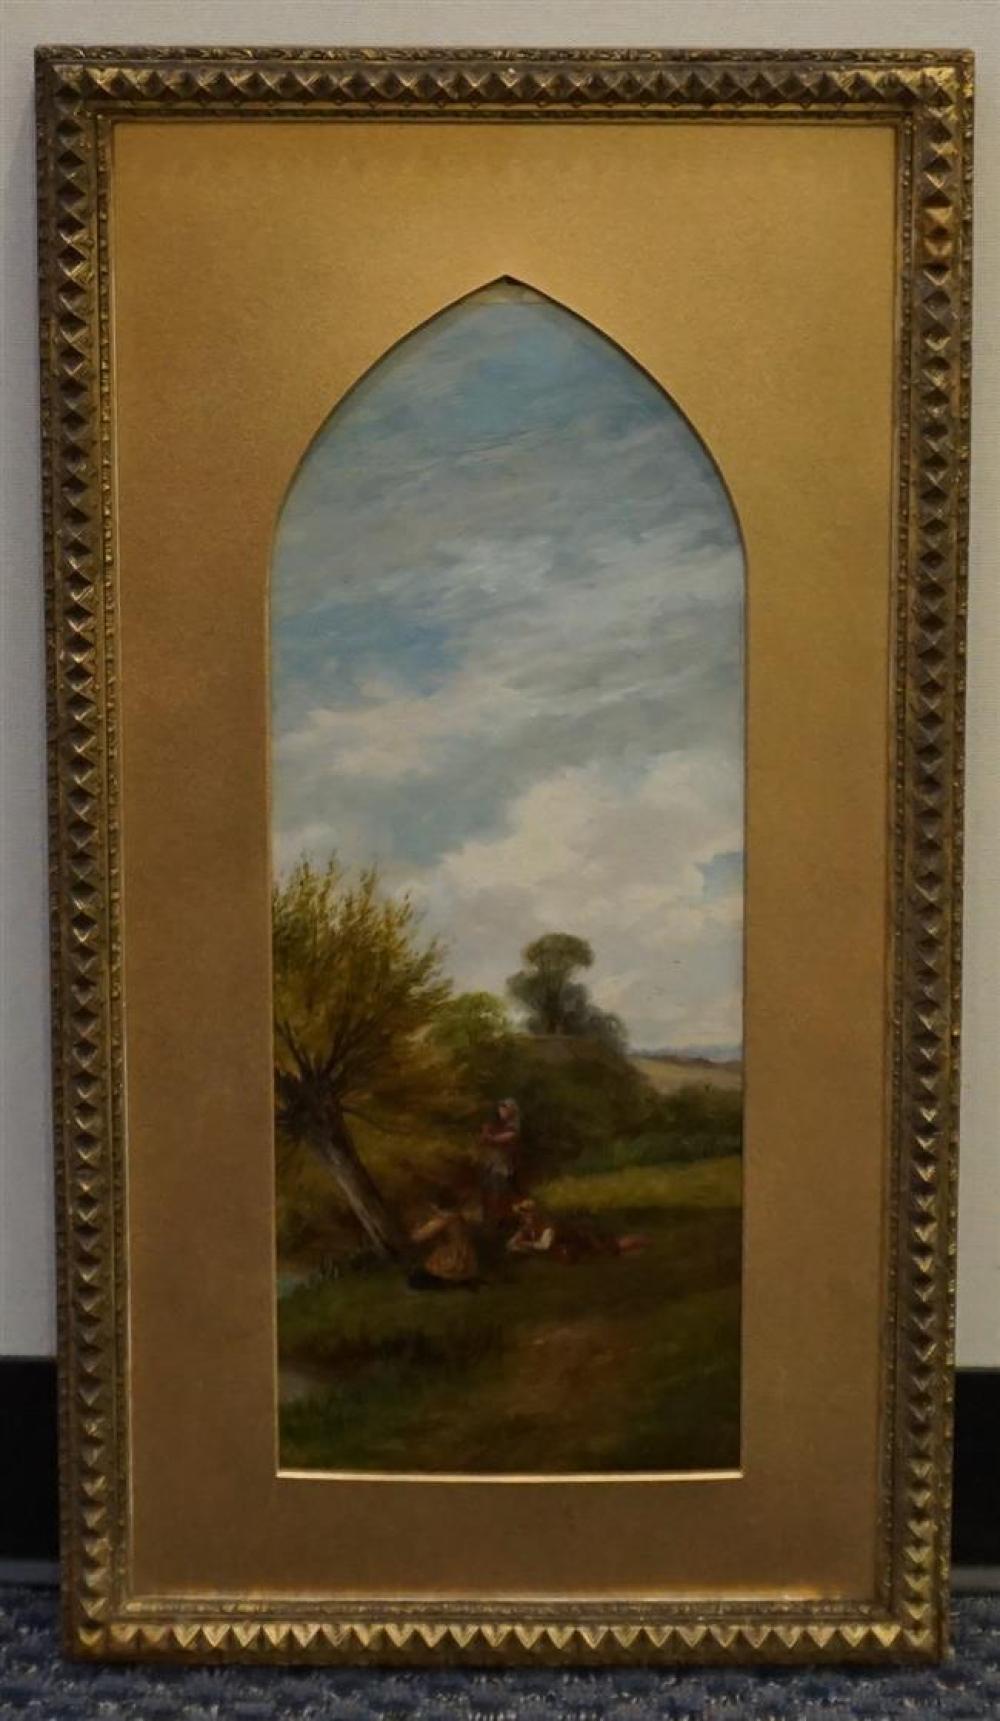 Frank Turner (English fl. 1863-1875) Children by a Stream, Oil on Artist Board, Frame: 29-1/2 x 16 in